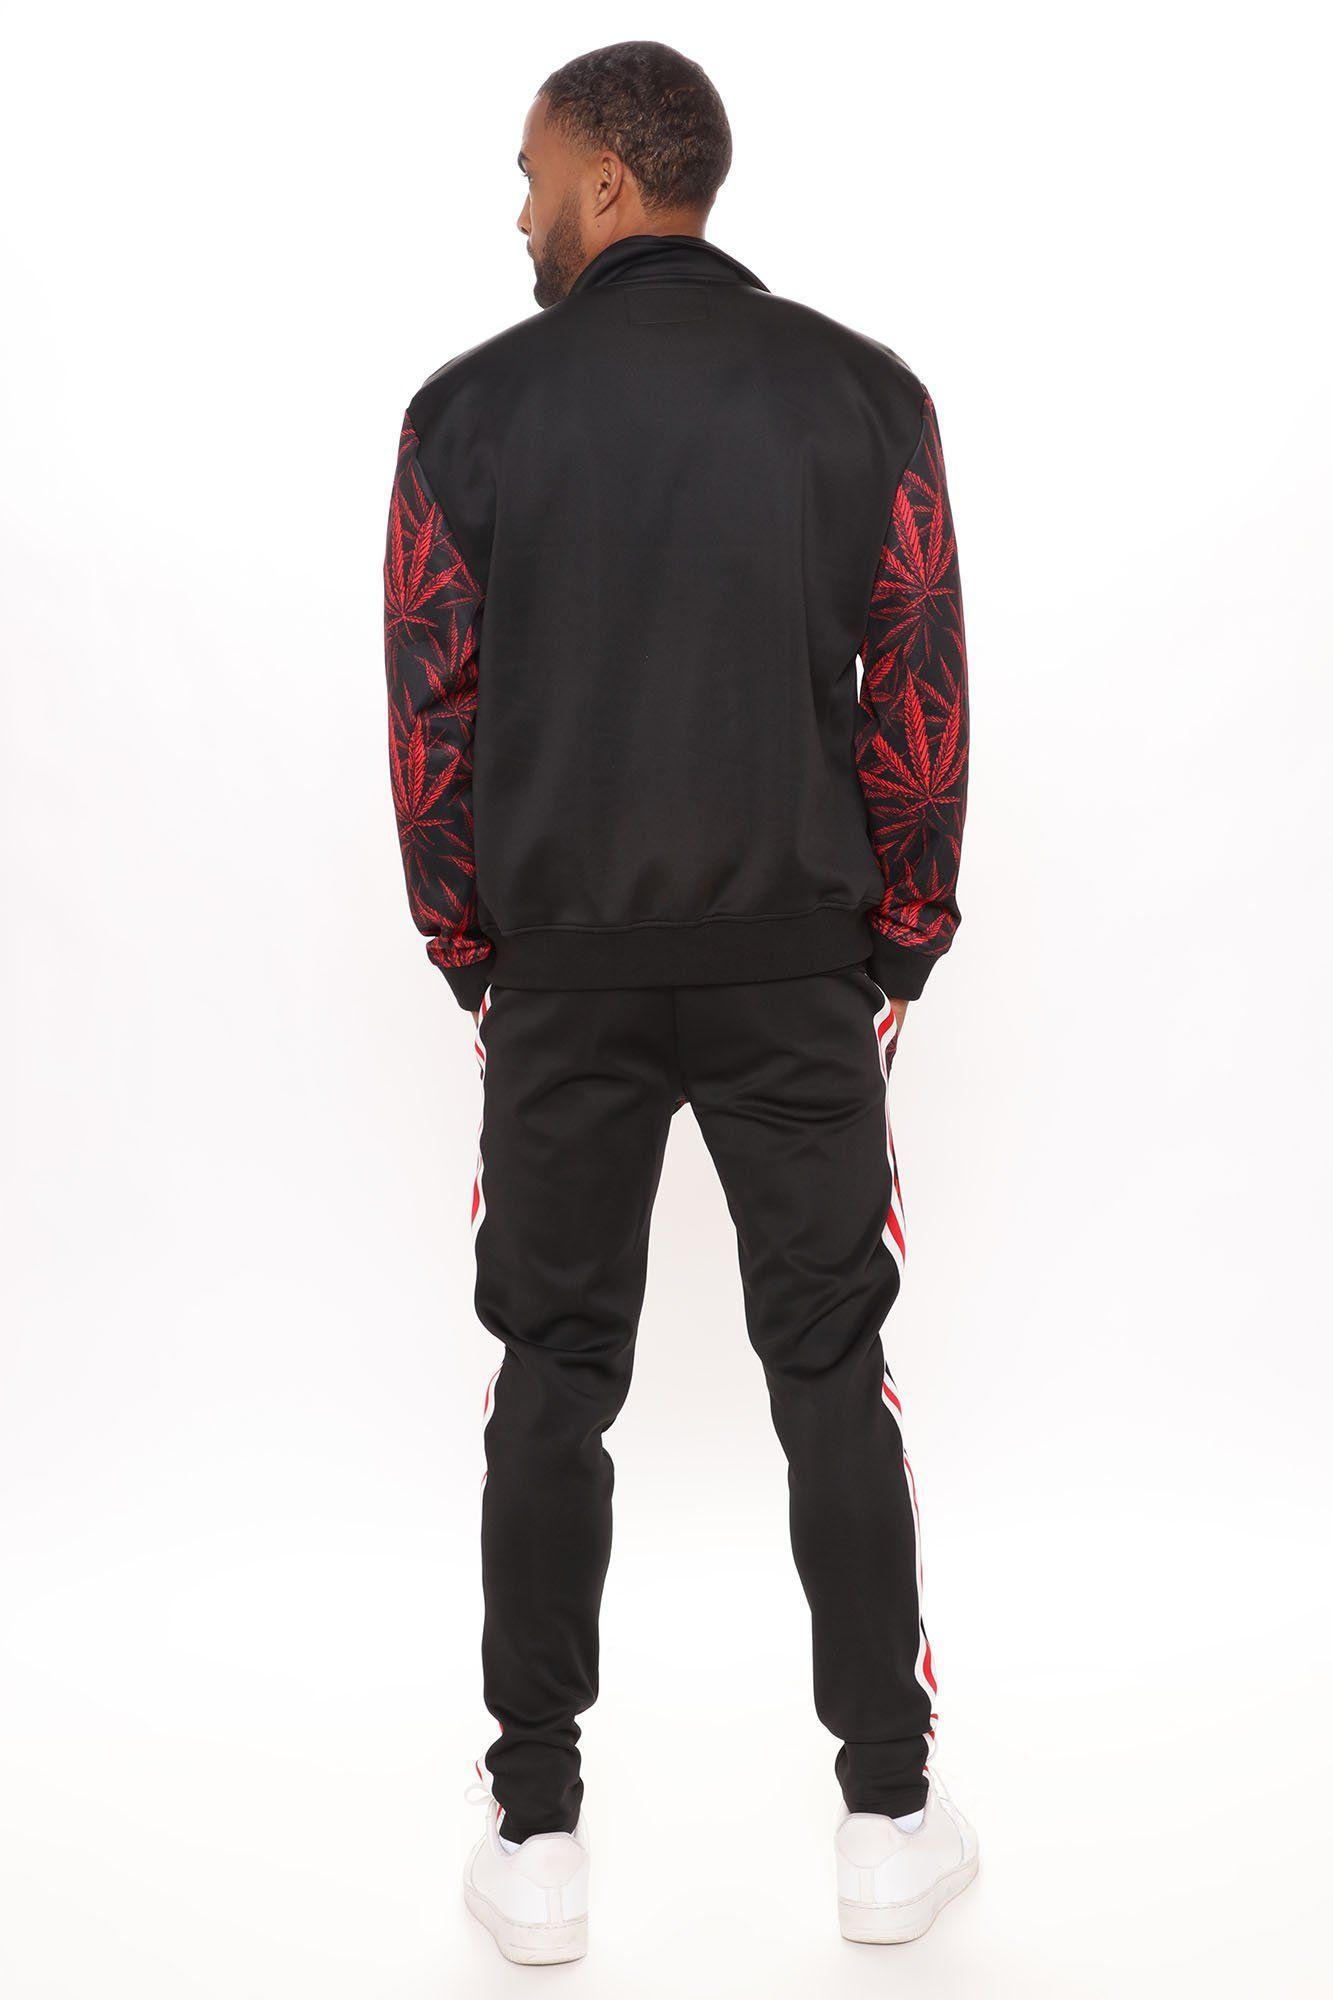 Mens Sunset Paradise Track Pant in Black Print size 2XL by Fashion Nova